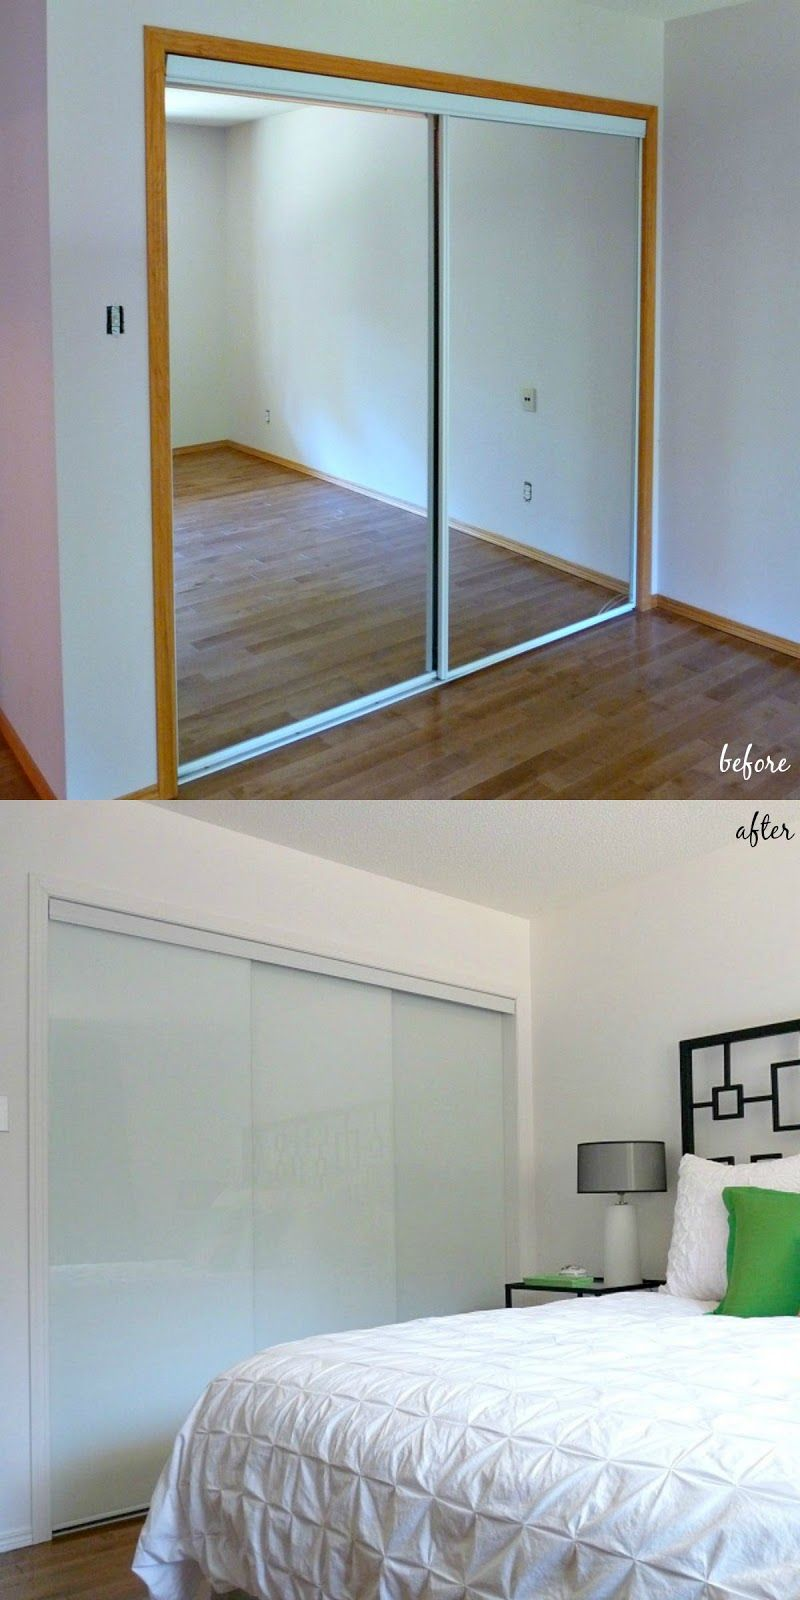 Mirrored Closet Doors | bathroom | Pinterest | Mirrored closet ...